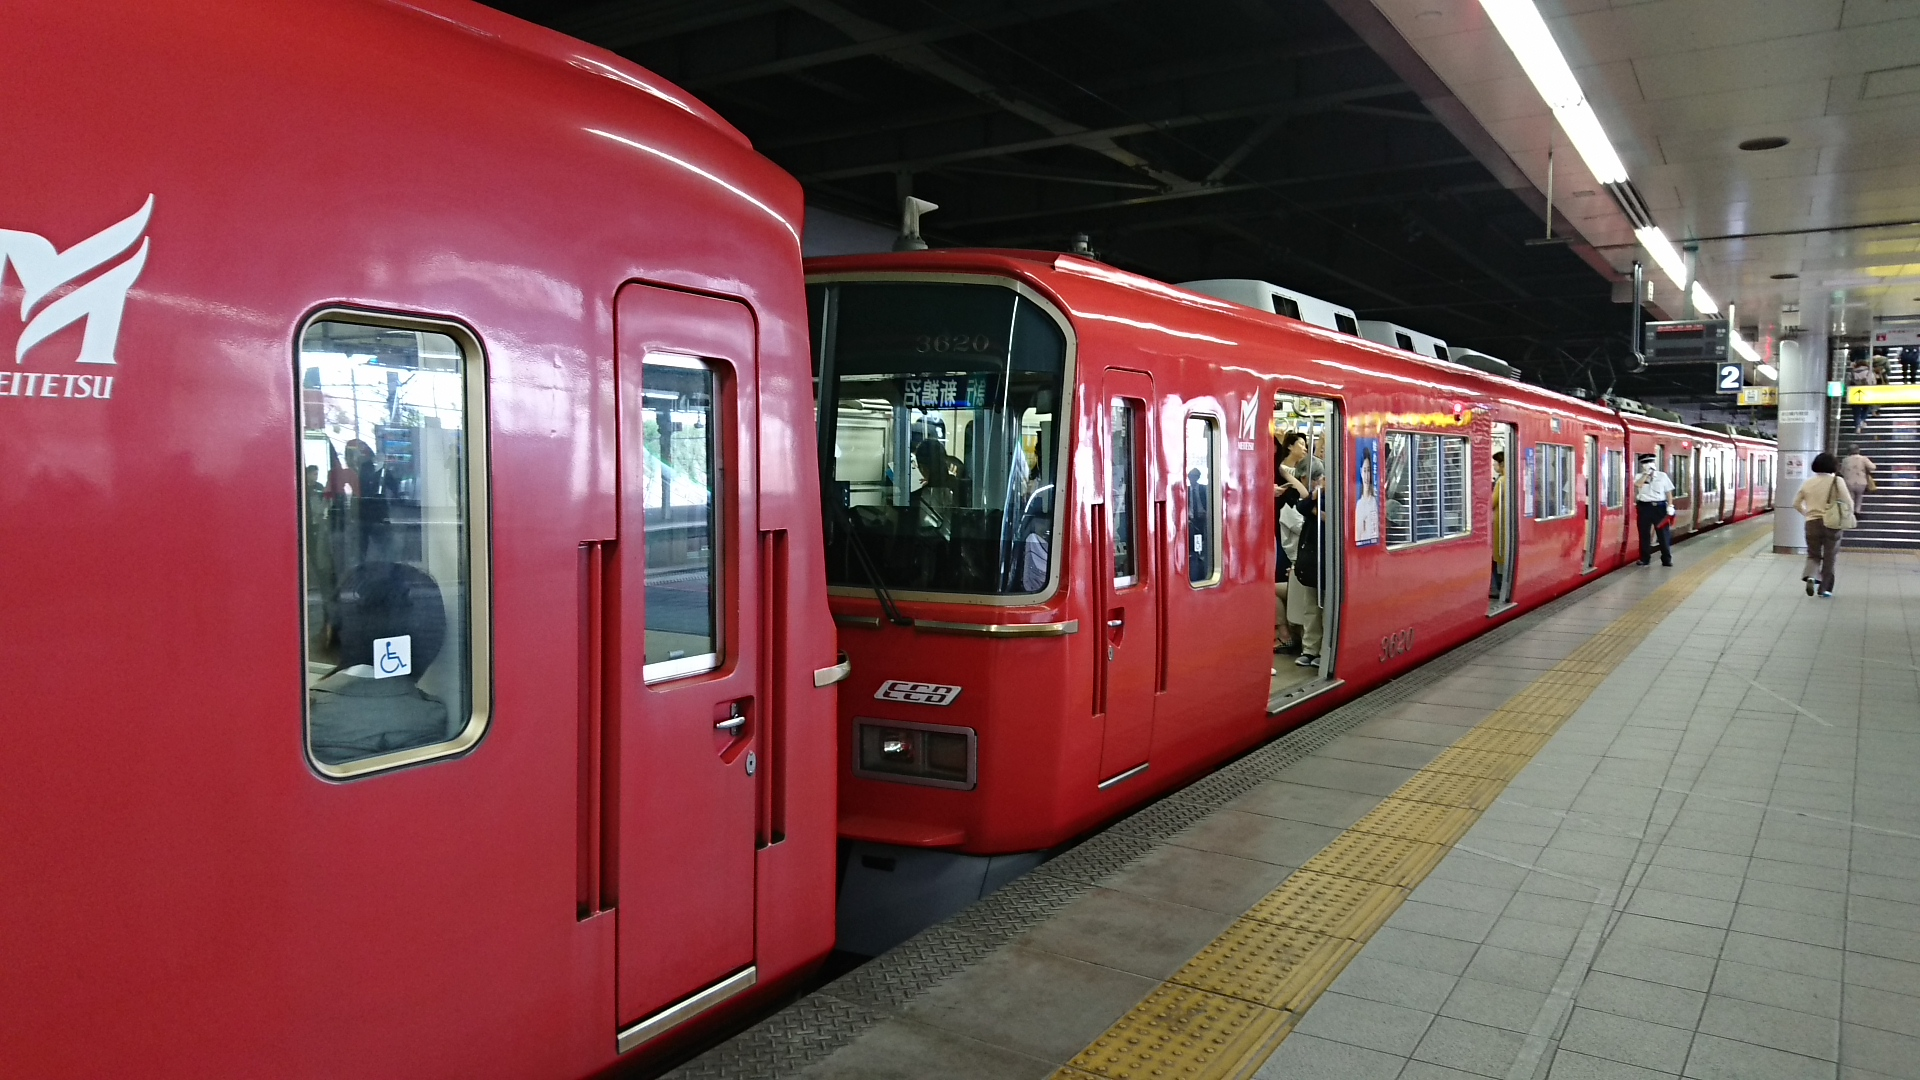 2017.5.9 名鉄 (7) 金山 - 新鵜沼いき急行「3500系」 1920-1080